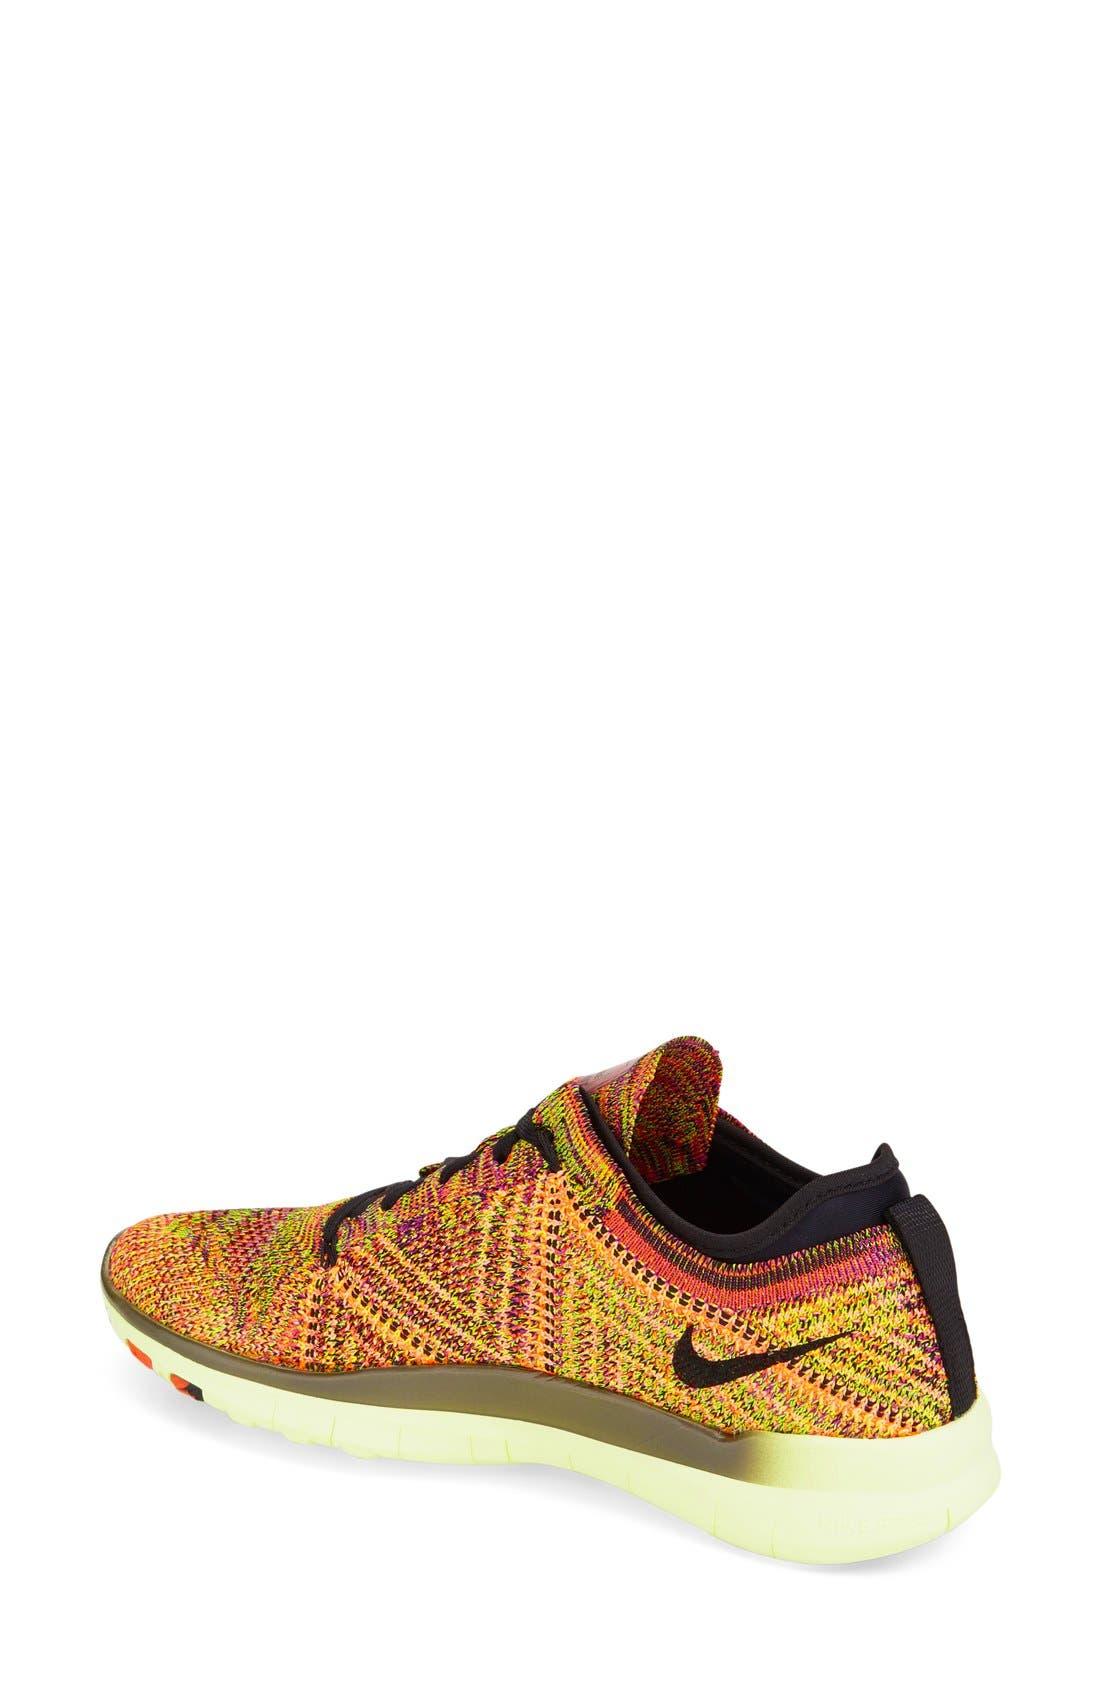 ,                             'Free Flyknit 5.0 TR' Training Shoe,                             Alternate thumbnail 70, color,                             899